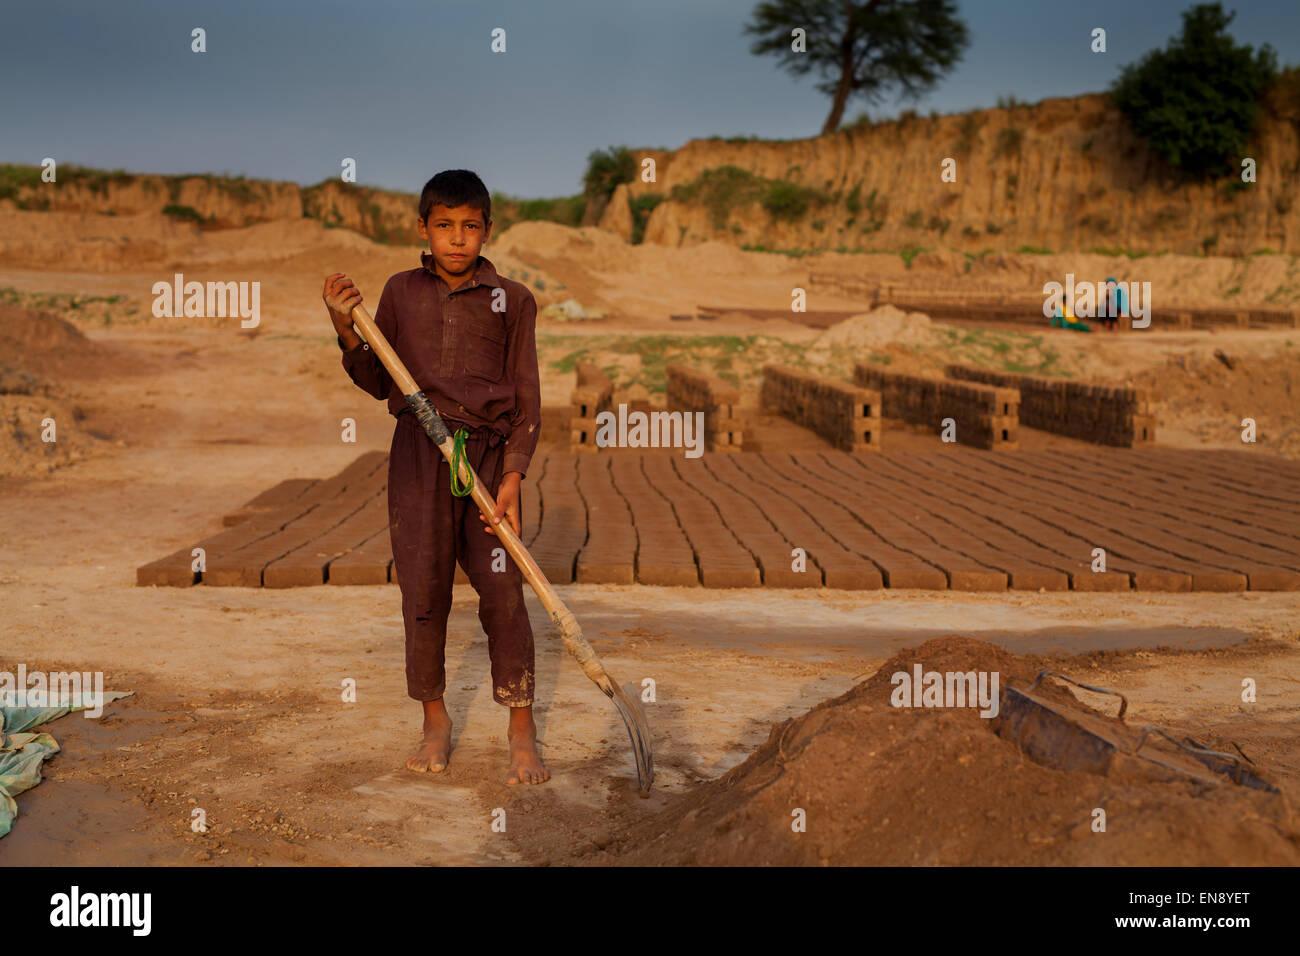 A Child laborer holding a shovel at brick making facility - Stock Image